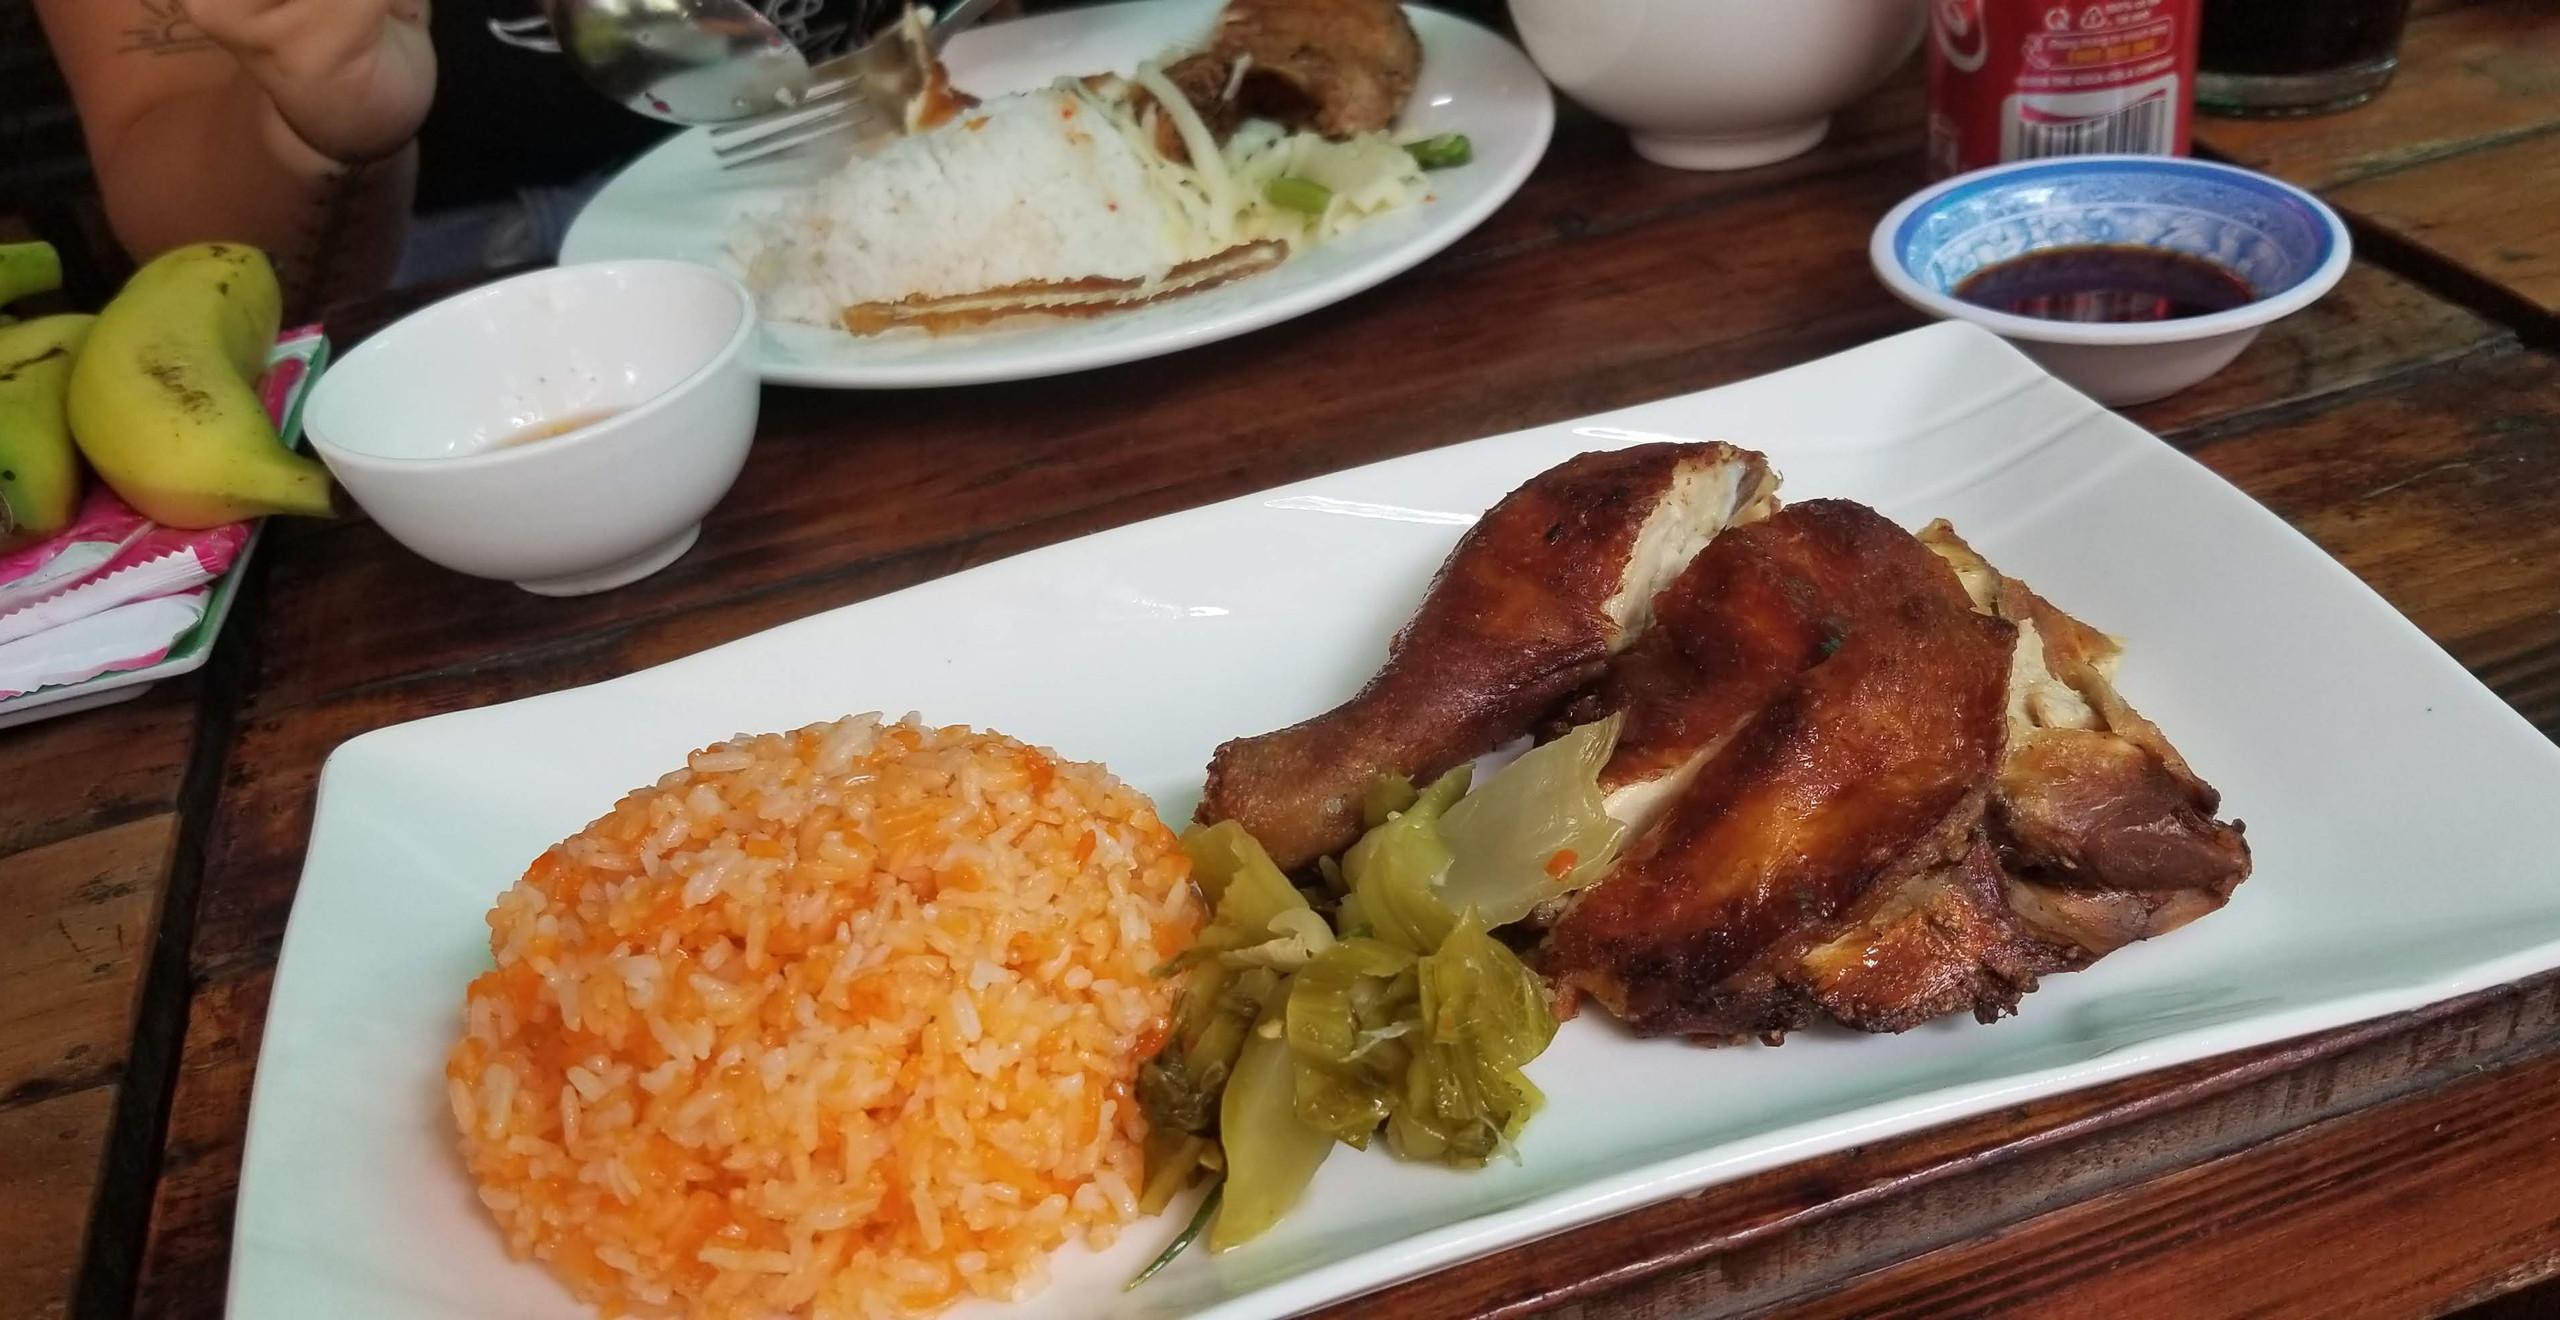 Crispy chicken with pickled veggies